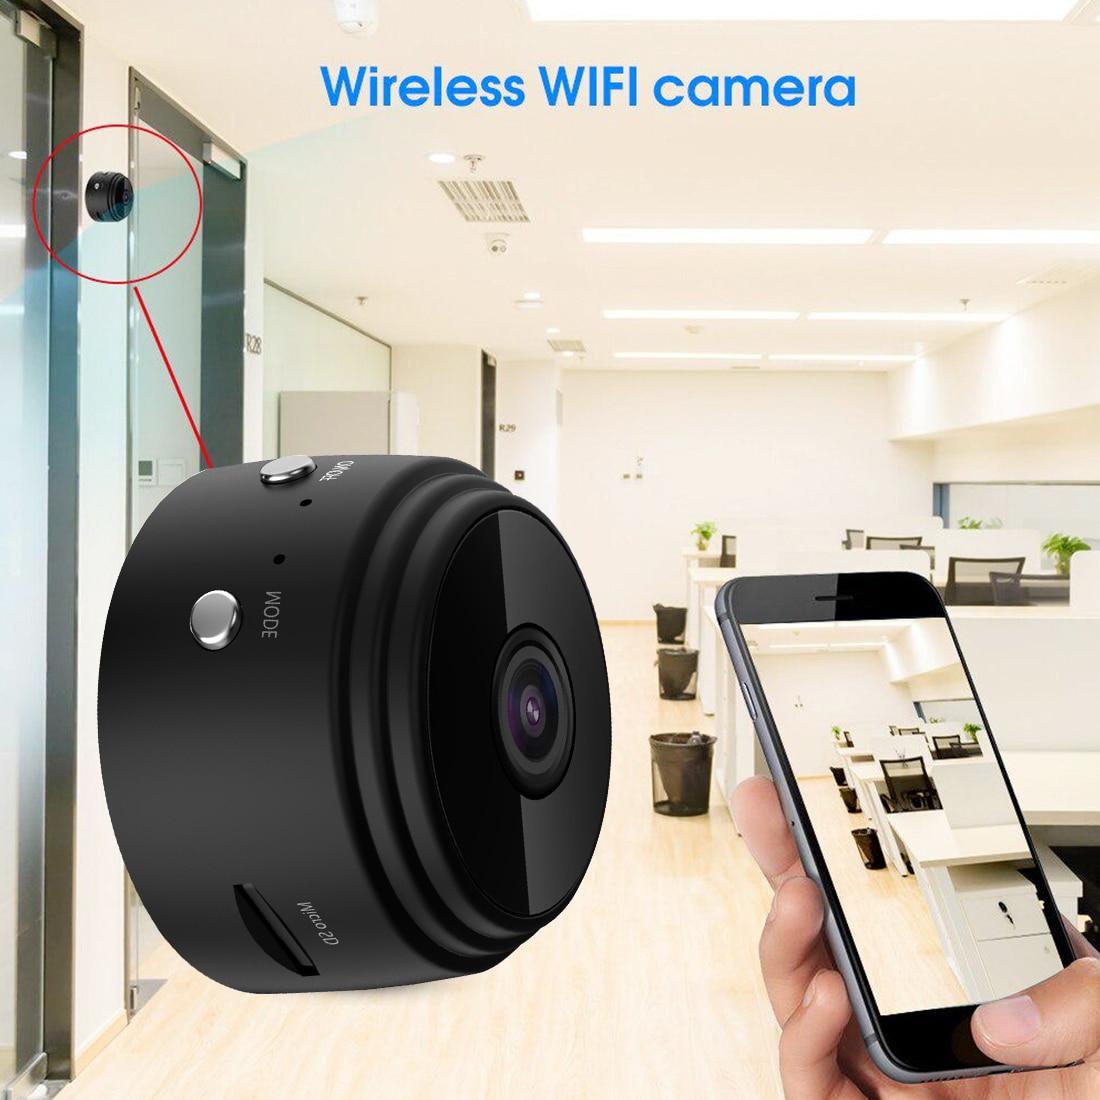 1080P Mini Wireless Camera A9 Wifi Camera Home Security Surveillance Camera Motion Detection IR Night Vision App Remote Monitor